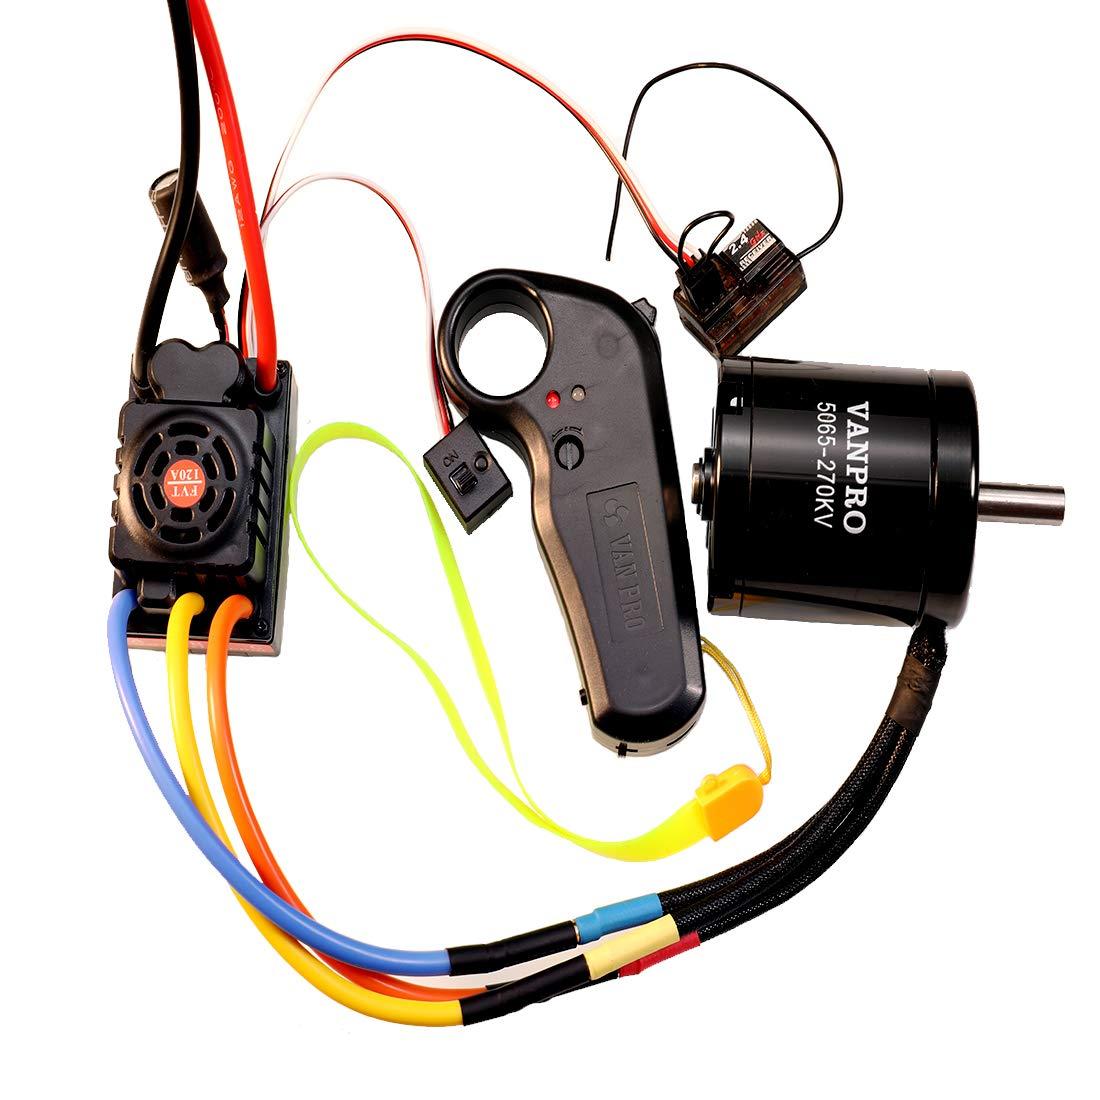 Amazon.com: vanpro - Monopatín eléctrico DIY V2 Edition 2.4G ...